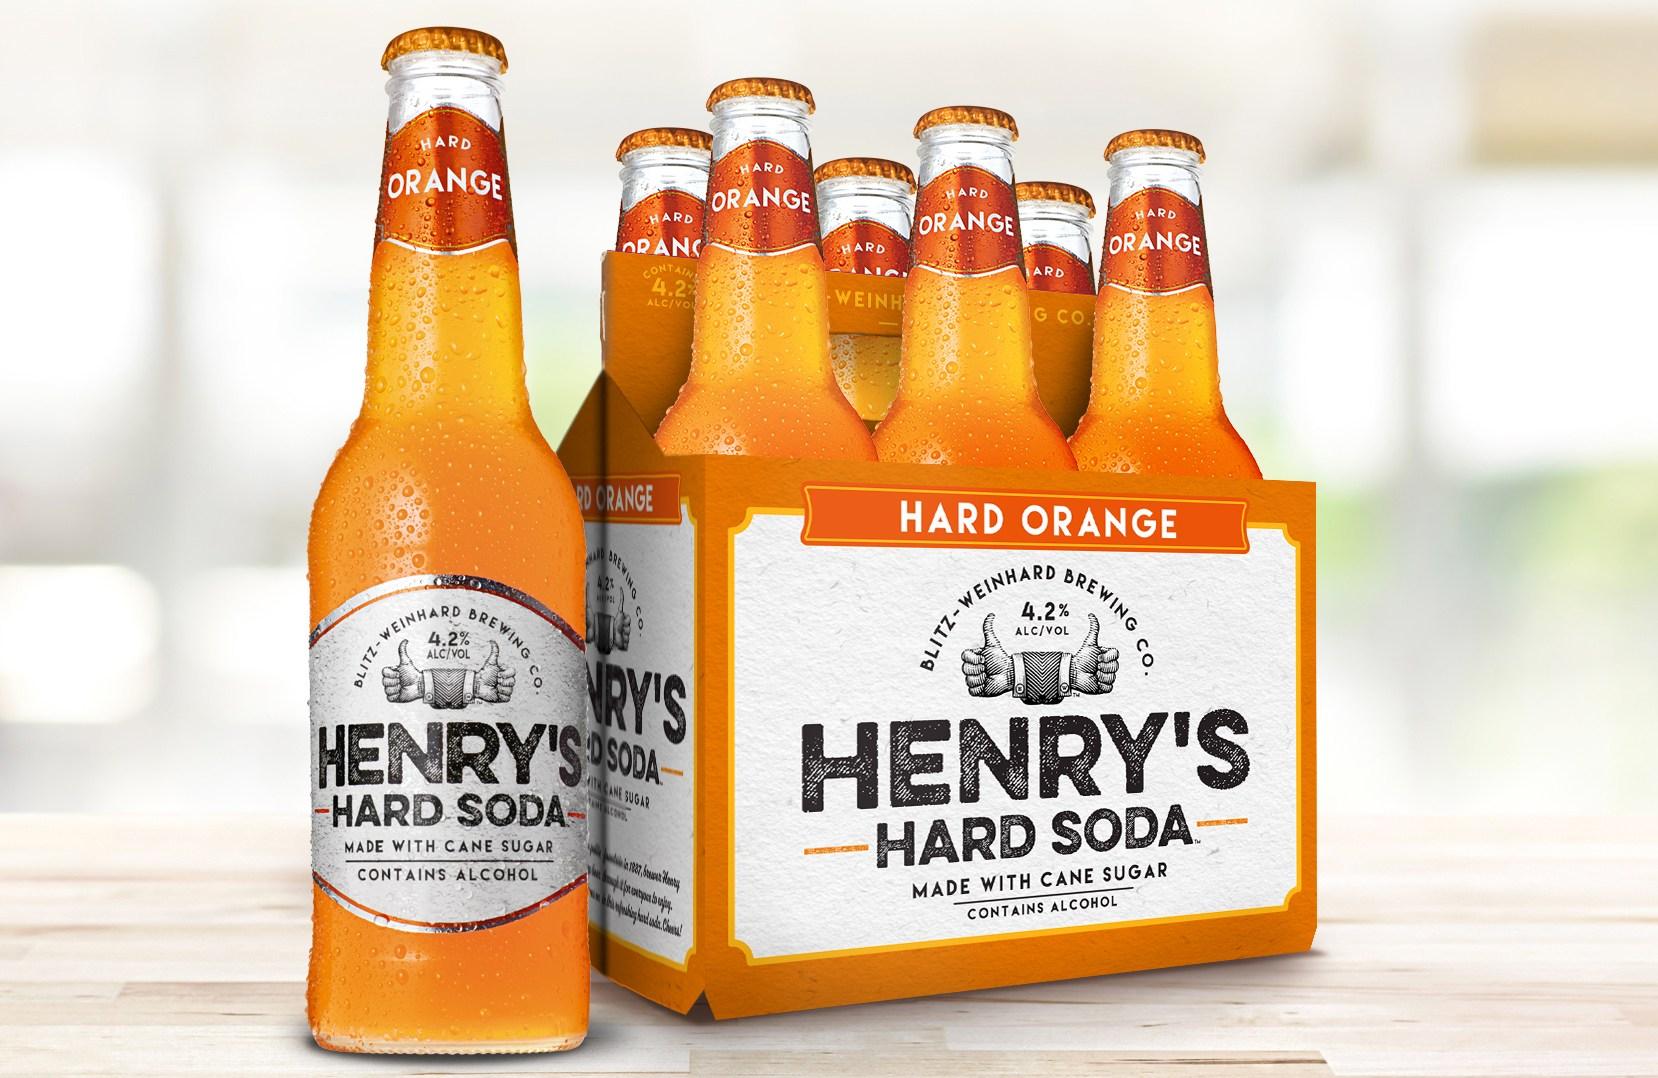 X_Henrys_Soda_FlavorSLIDER_orange.jpg